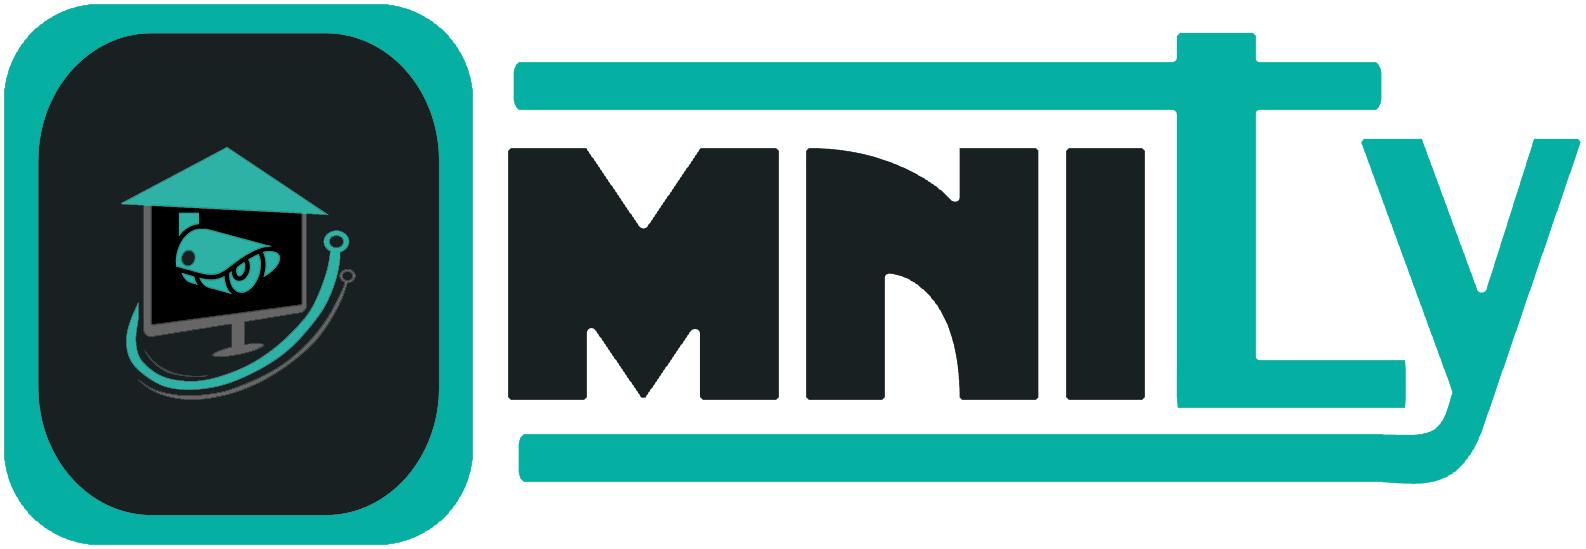 Omnity-logo-ecommerce-website-software-development-web-branding-ci-digital-marketing-spatter-media-001